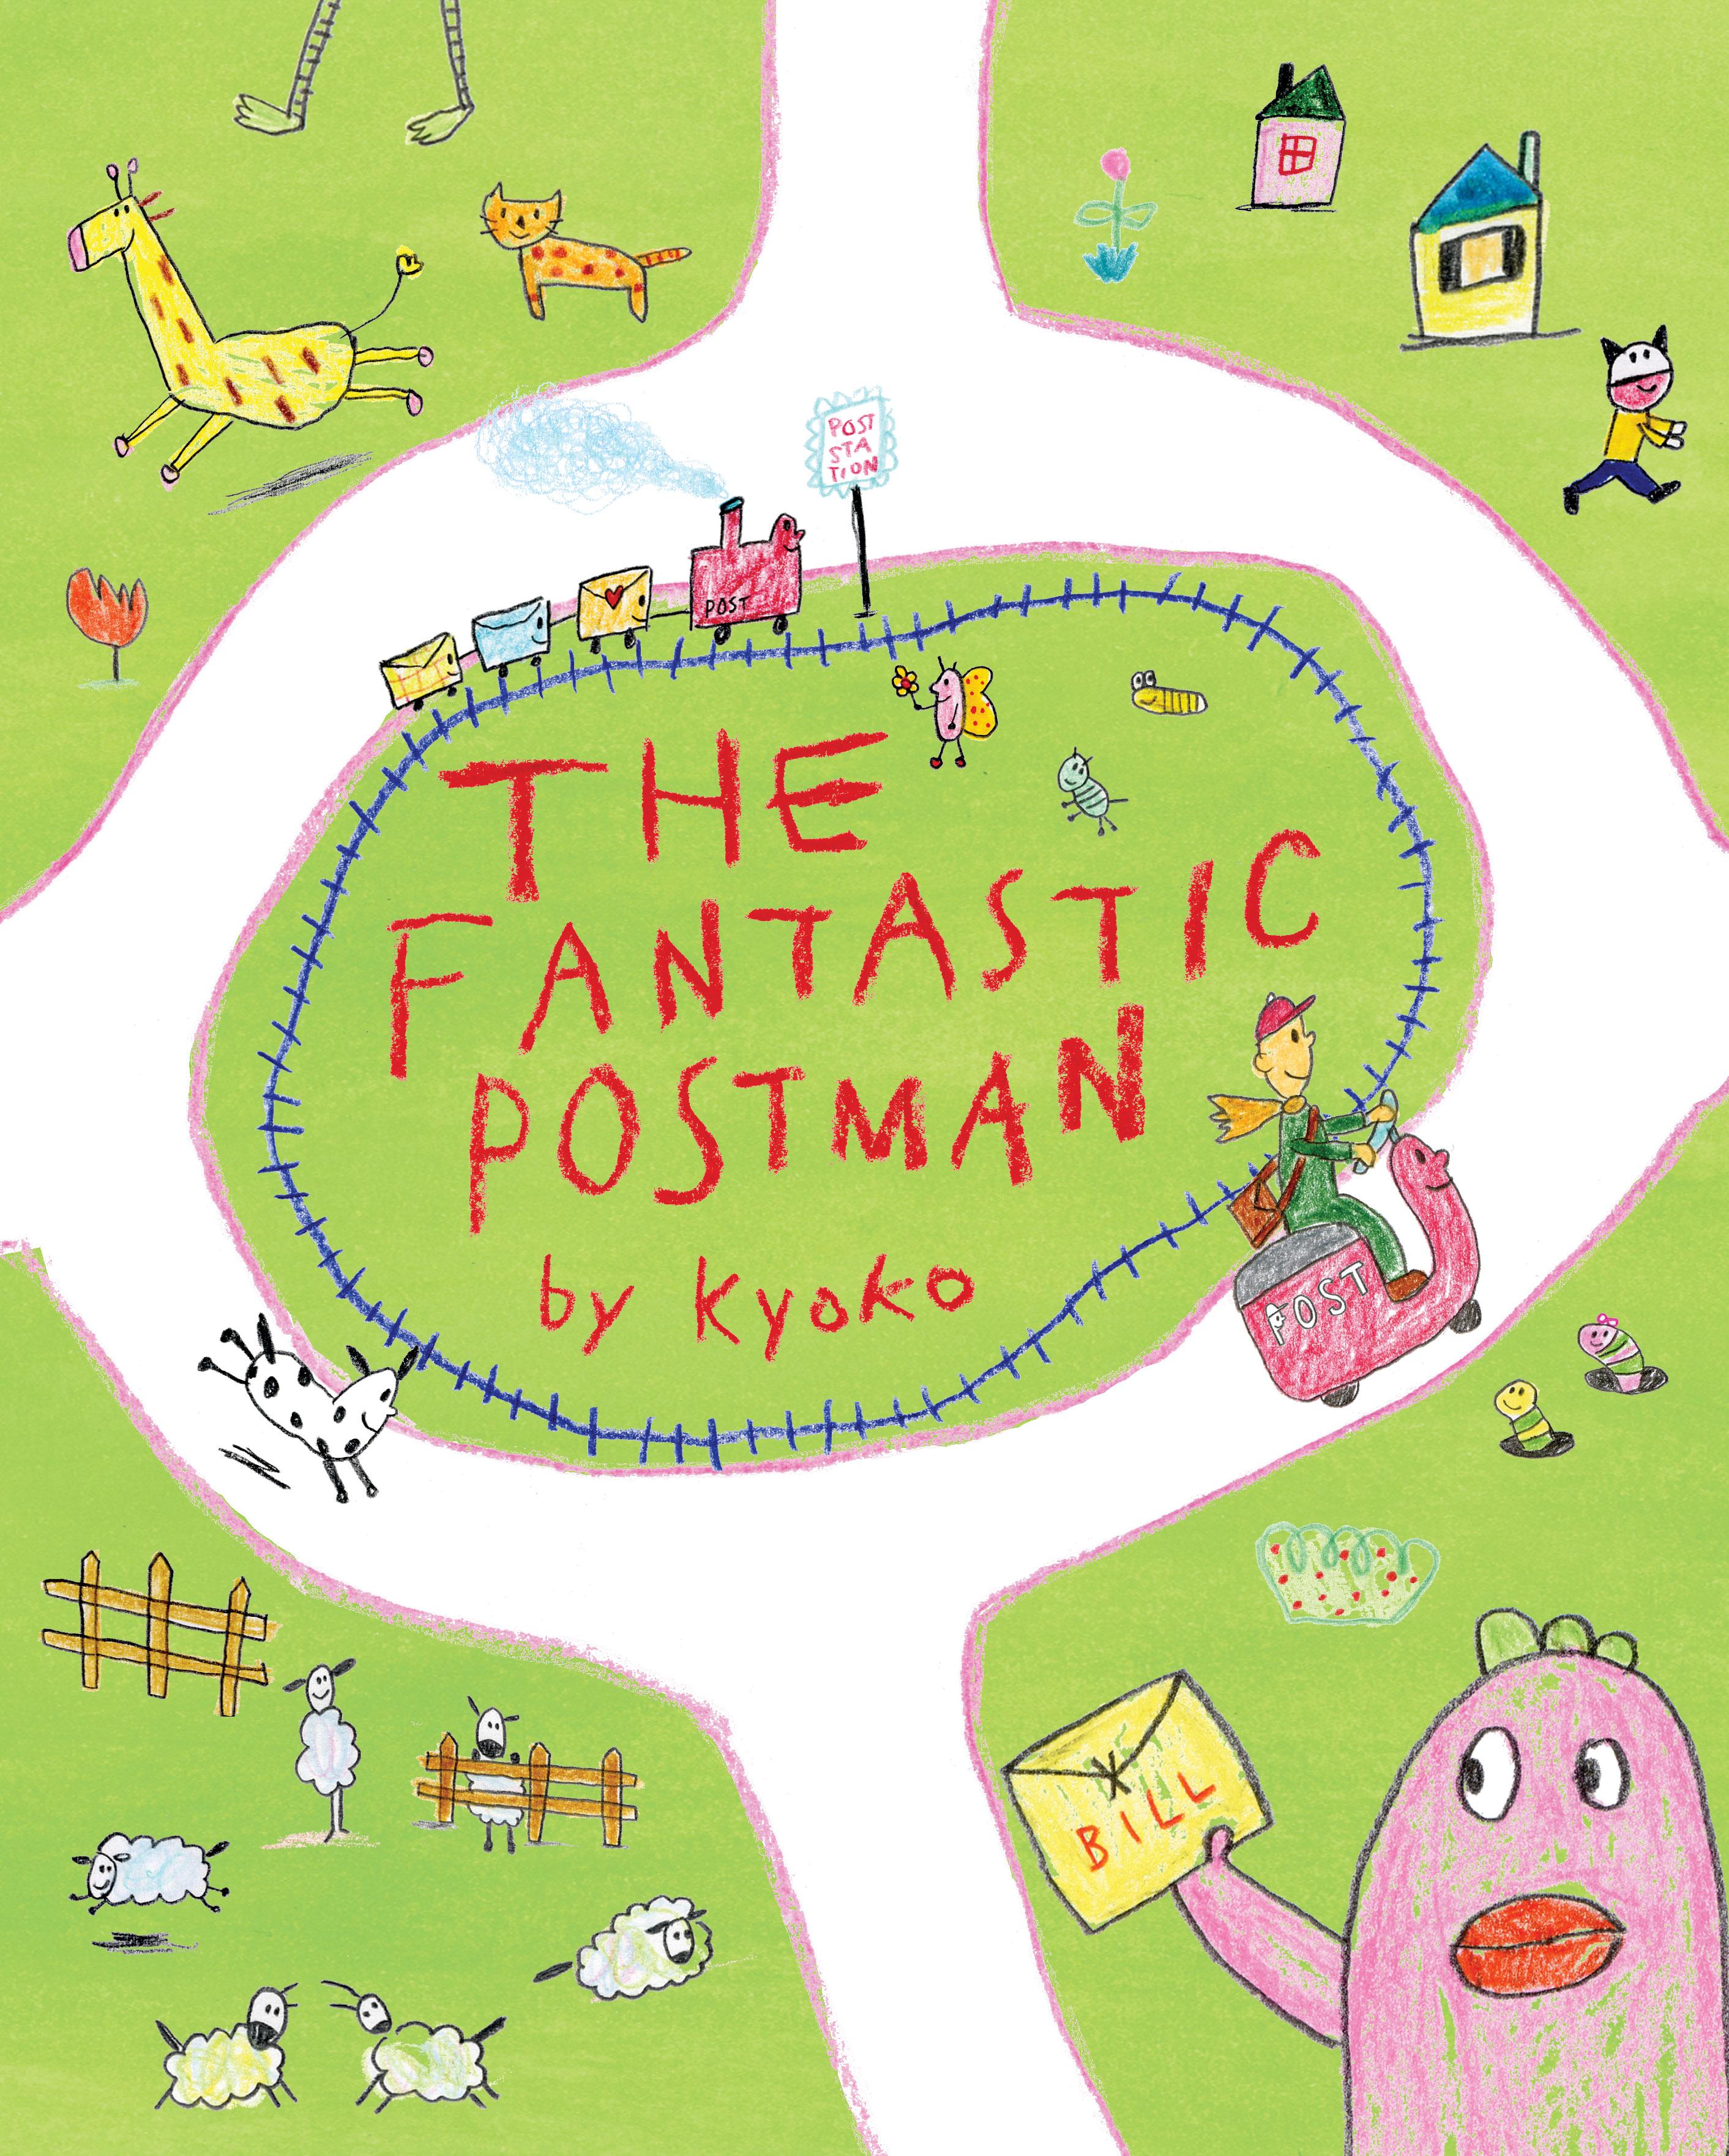 THE FANTASTIC POSTMAN